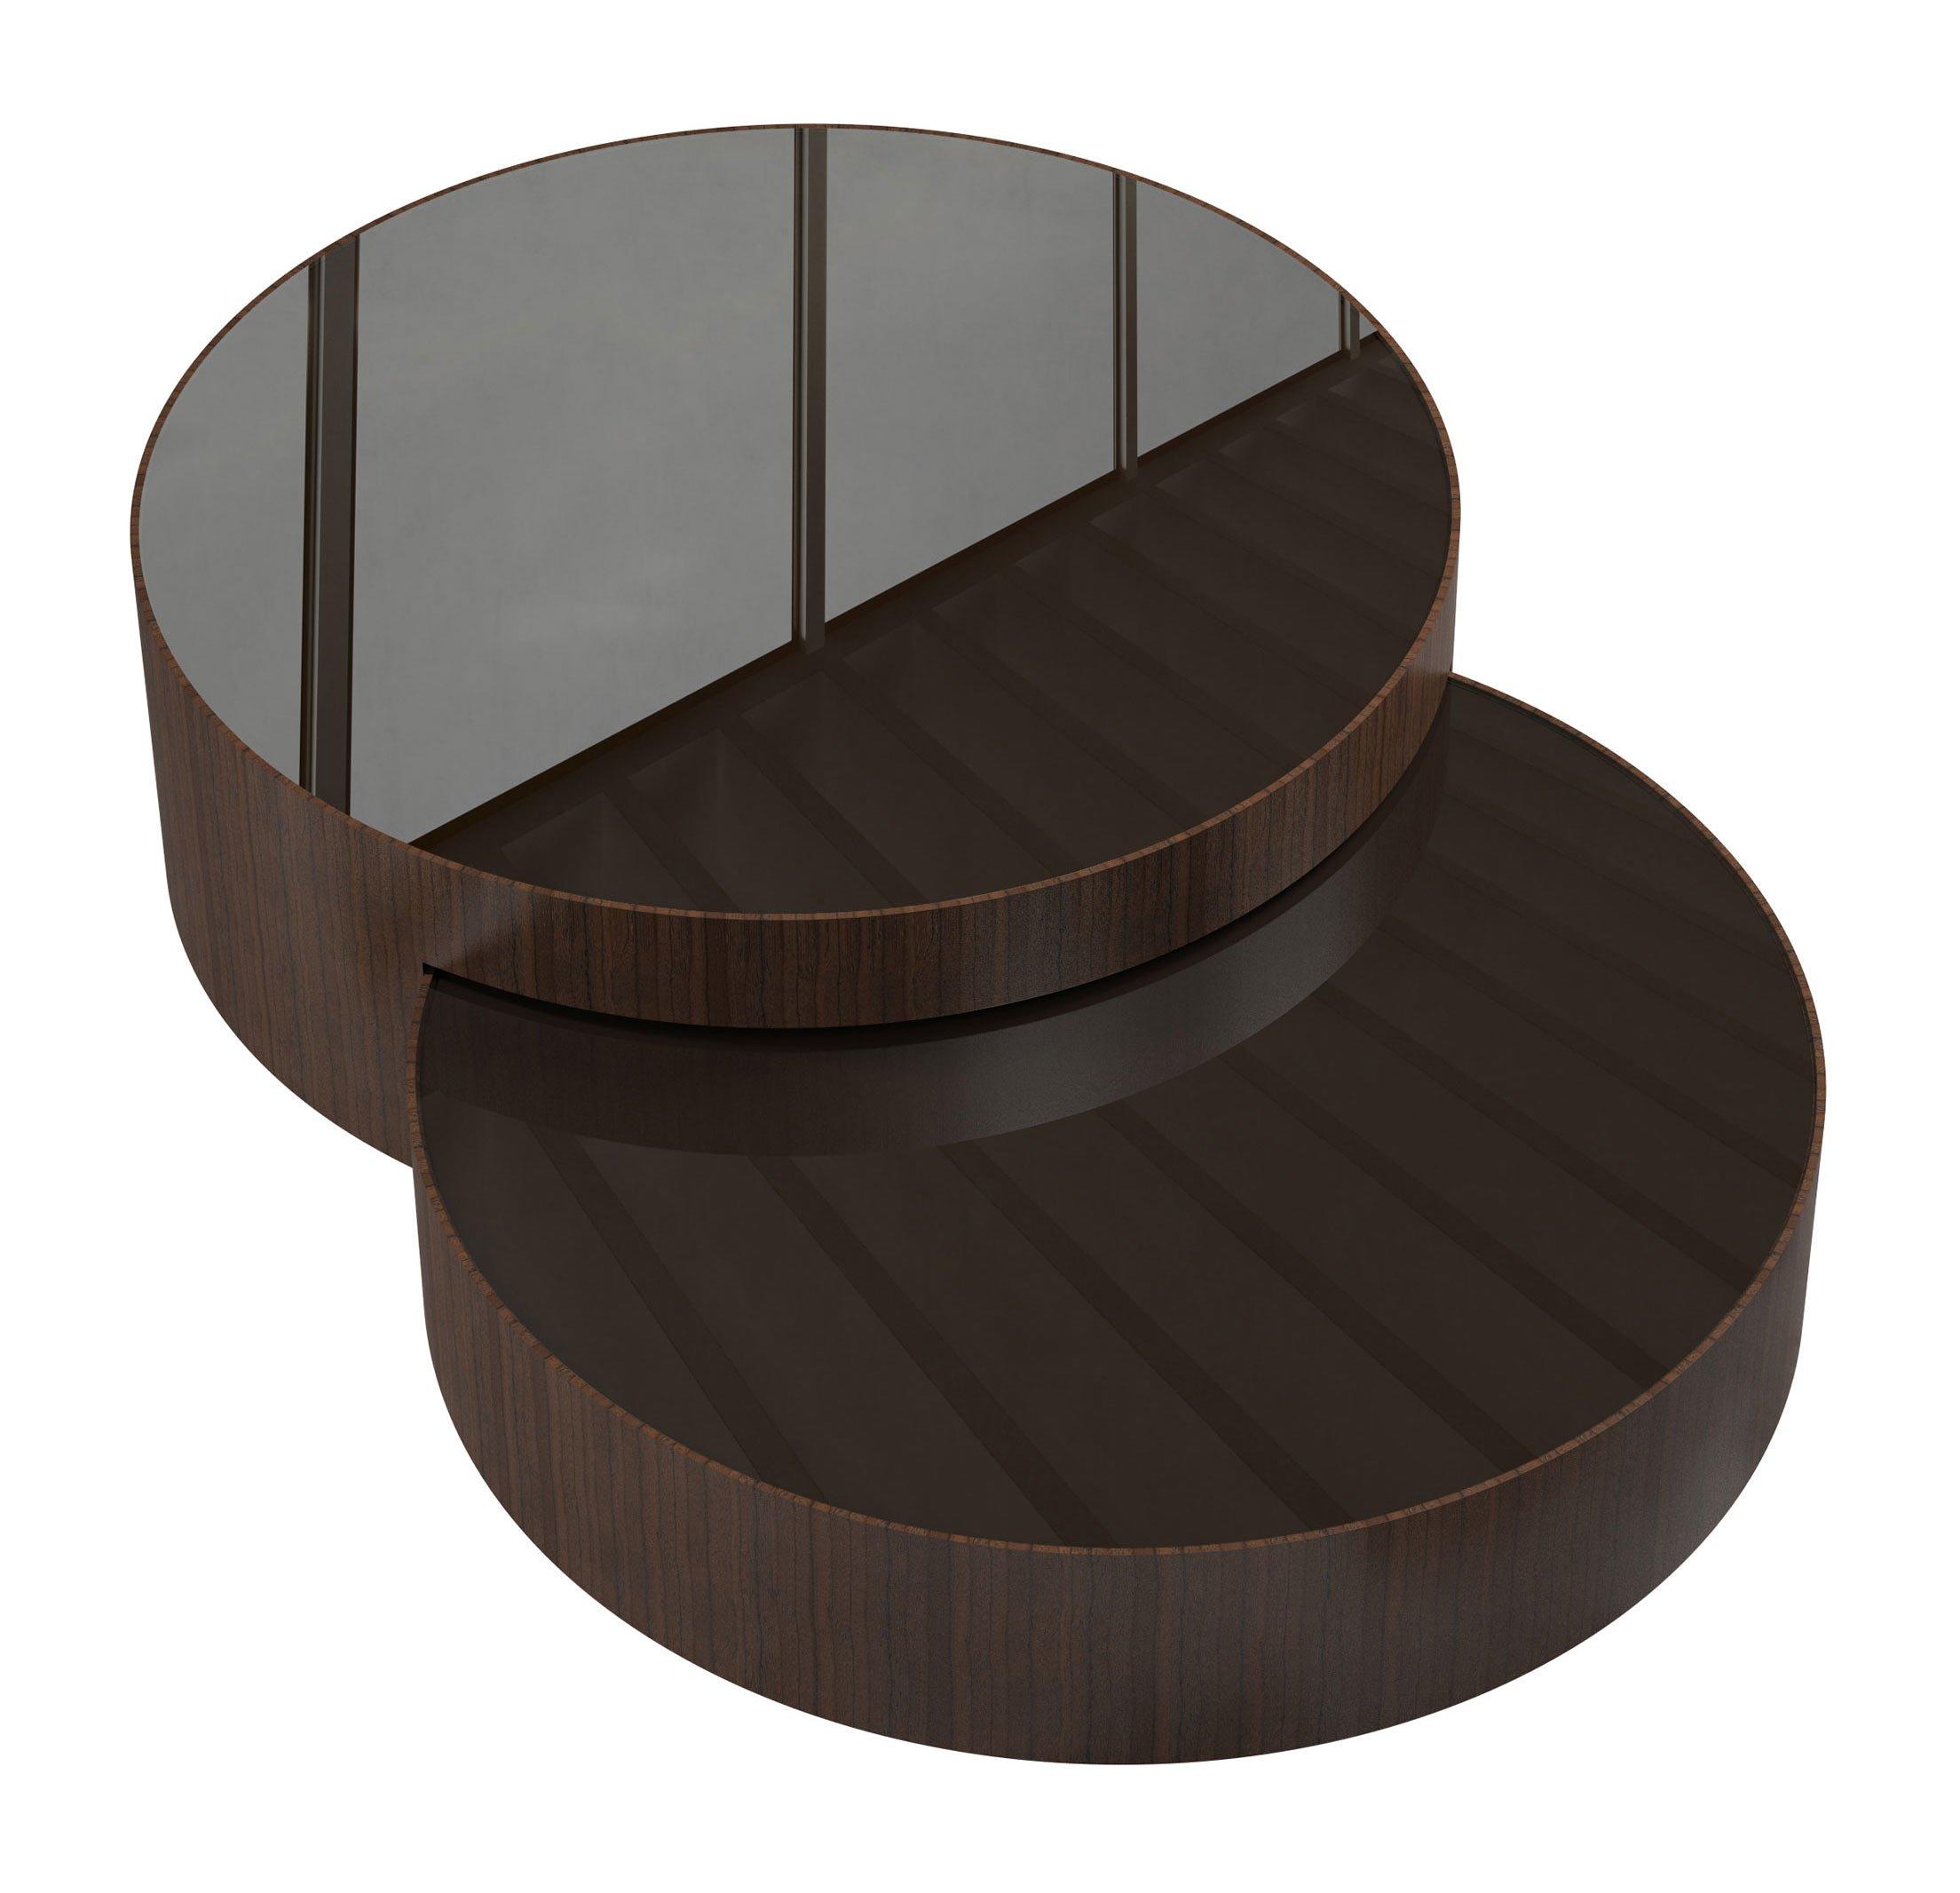 Berkeley Nesting Coffee Table Brown Glass on Rovere Grigio by Modloft